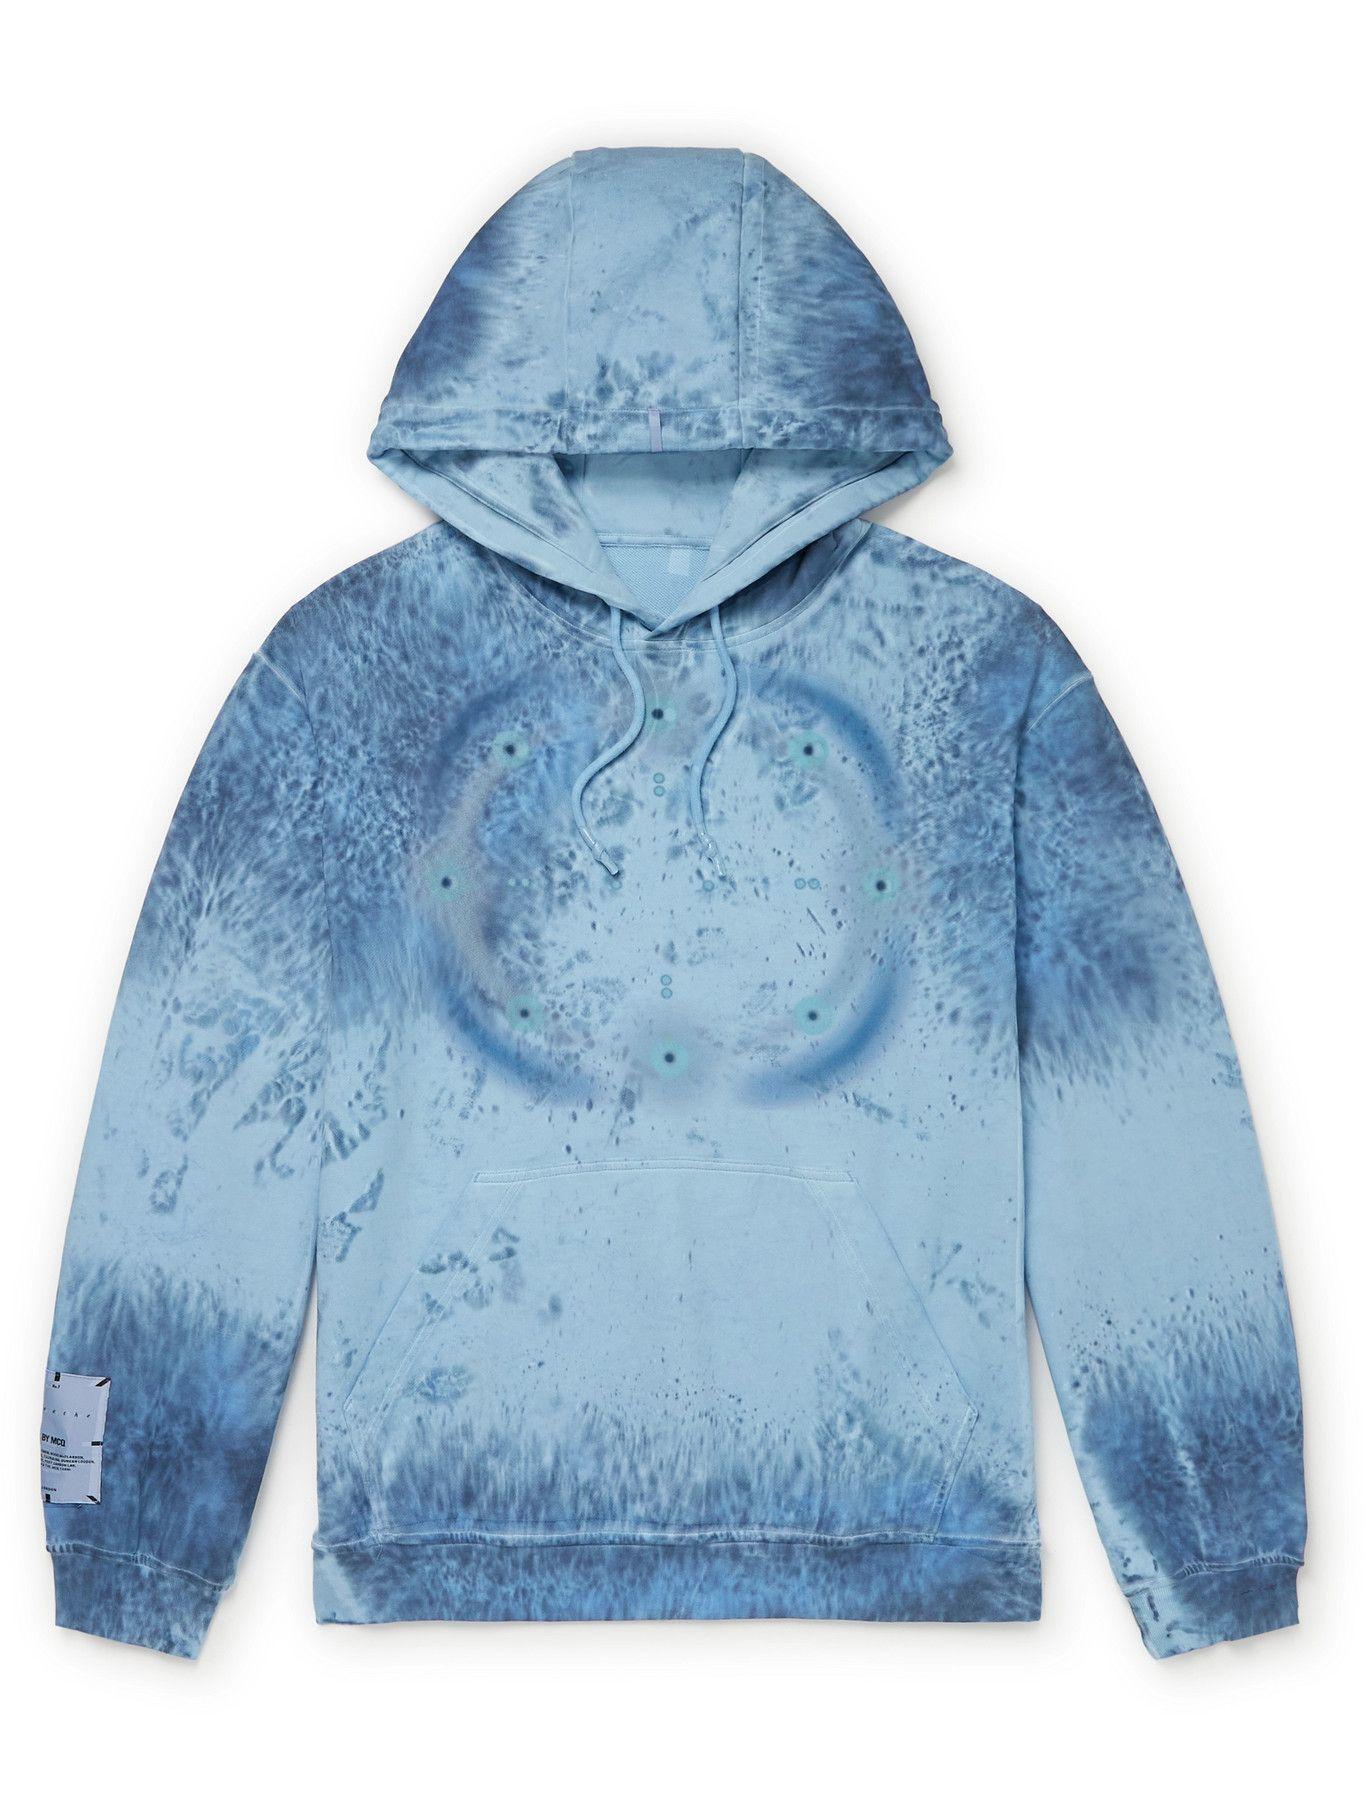 MCQ - Breathe Logo-Appliquéd Printed Cotton-Jersey Hoodie - Blue